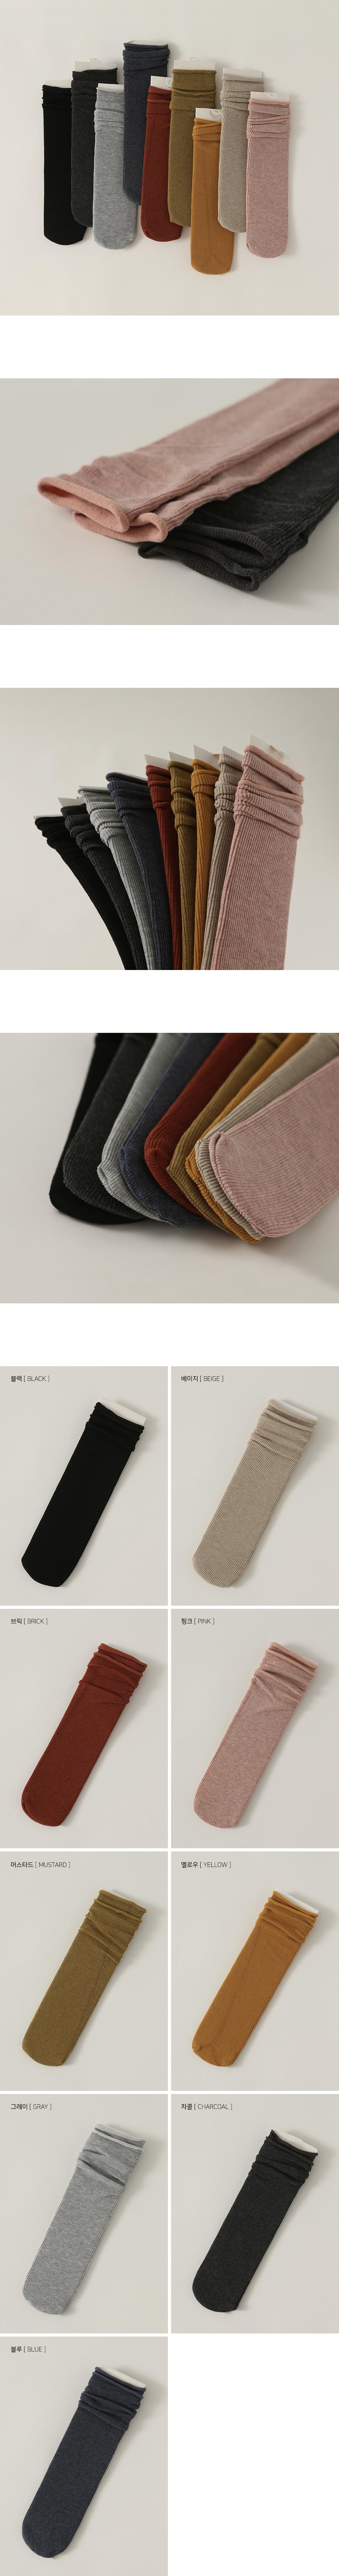 Ribbed color socks doldolyi ACSCM0d709